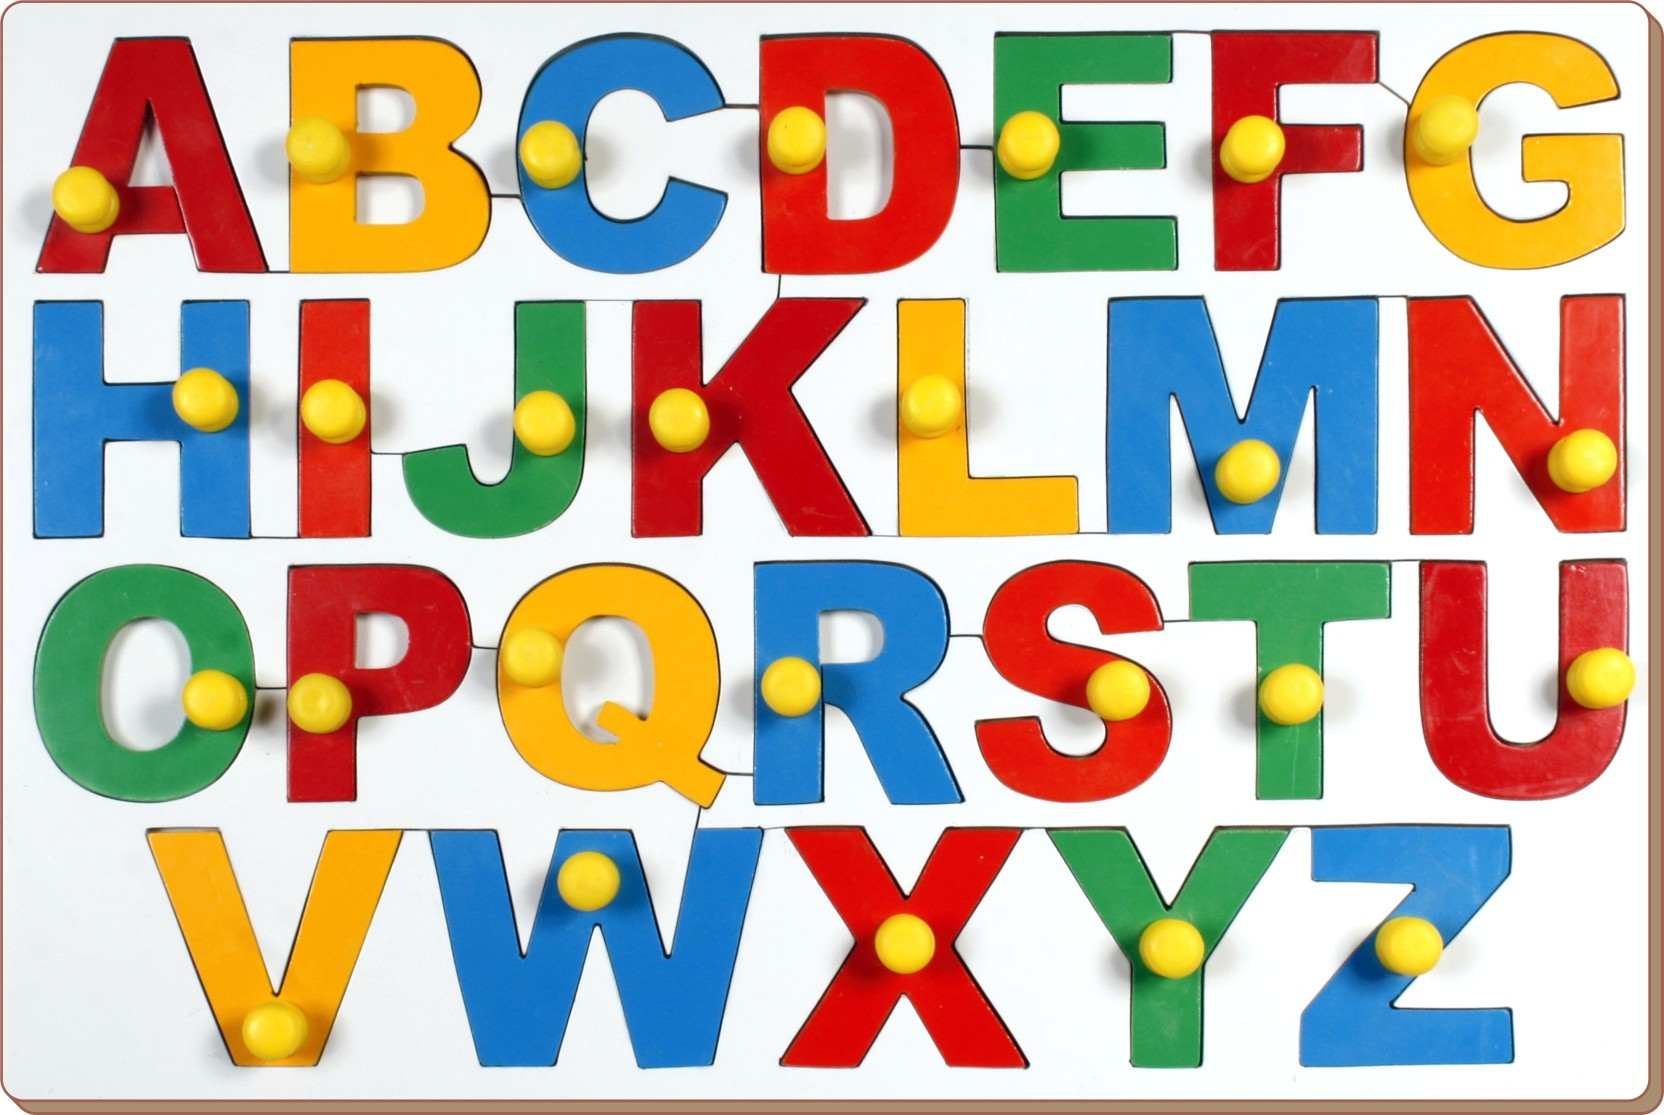 Little Genius Jumbo Alphabets Abc With Big Knobs Puzzle Knob Share